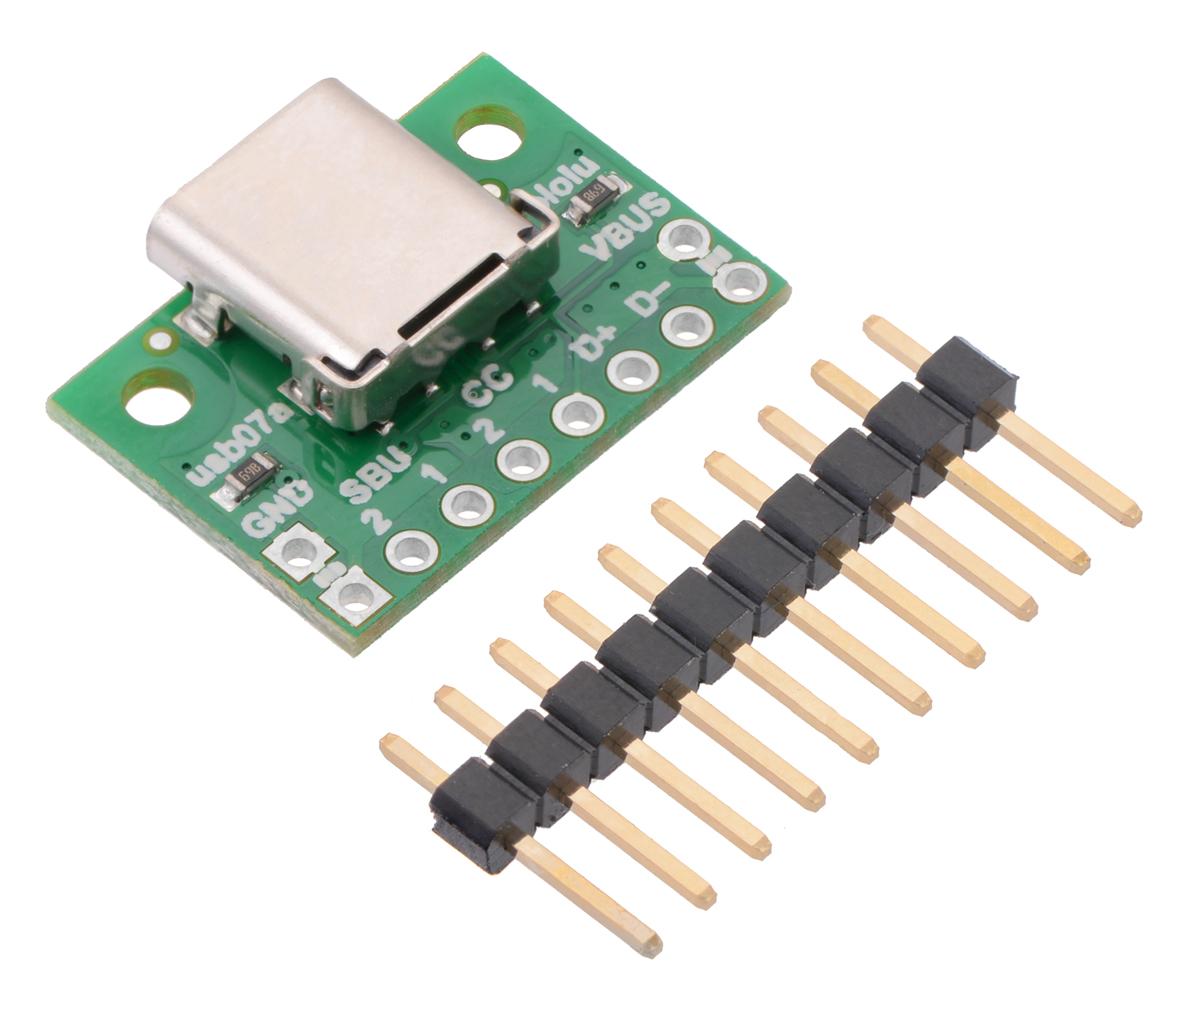 medium resolution of usb 2 0 type c connector breakout board